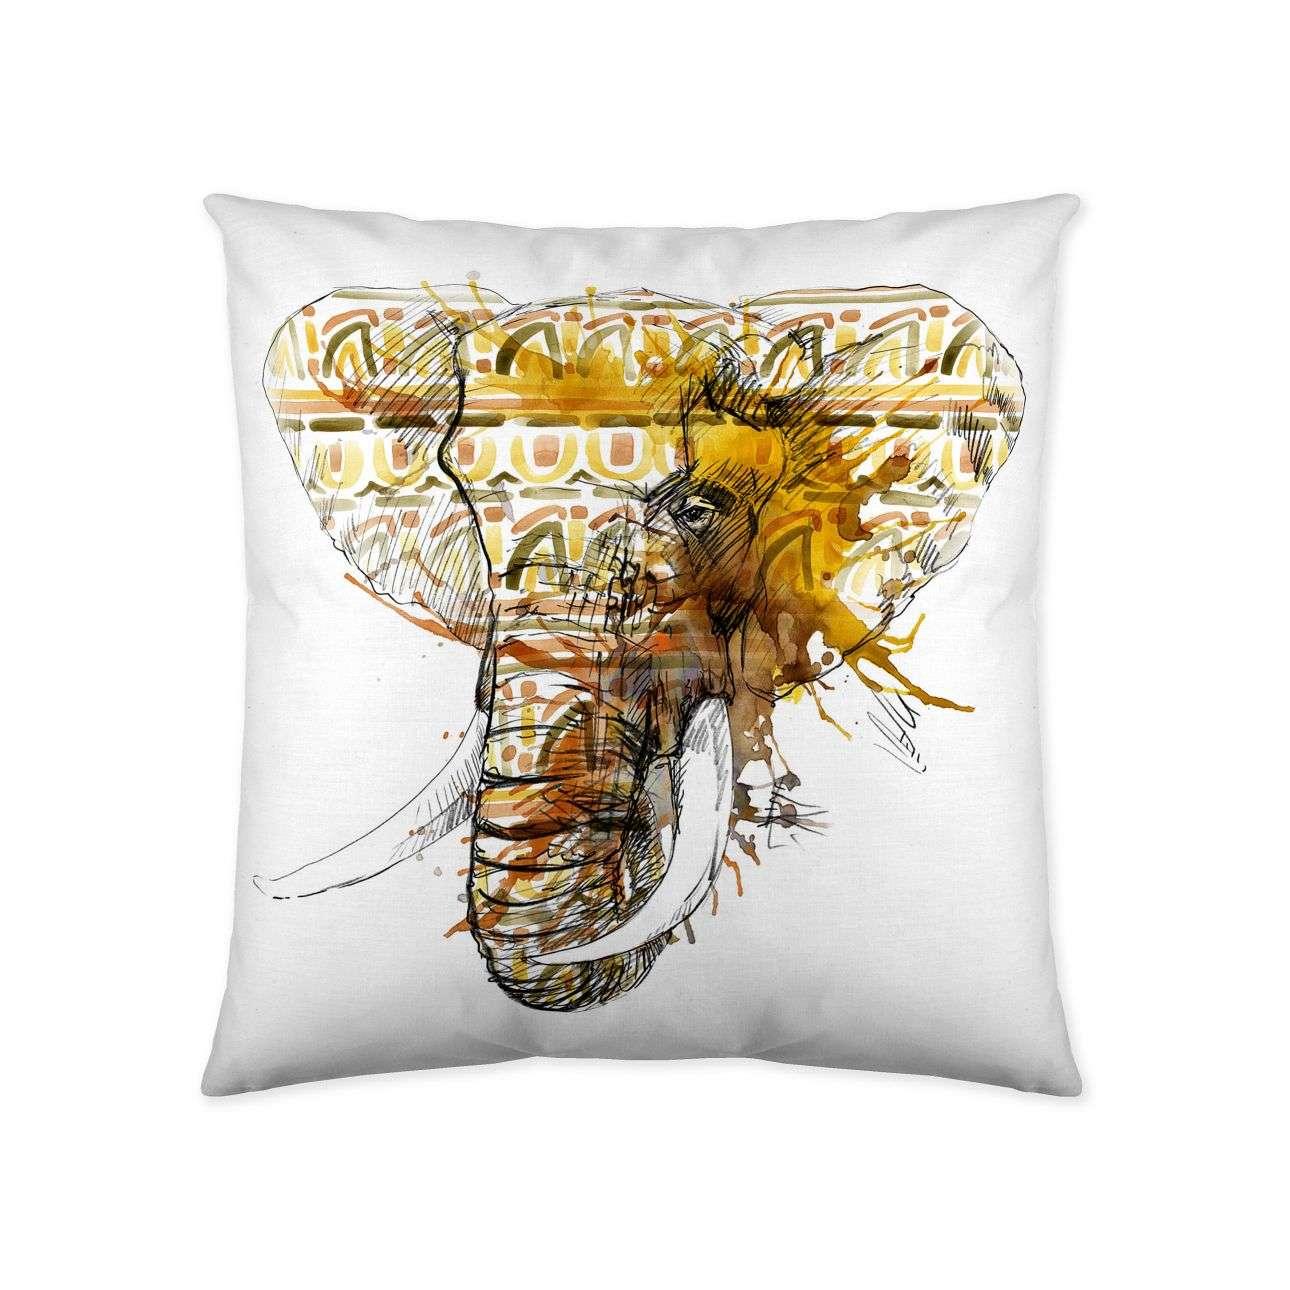 Elephant Head 45x45cm